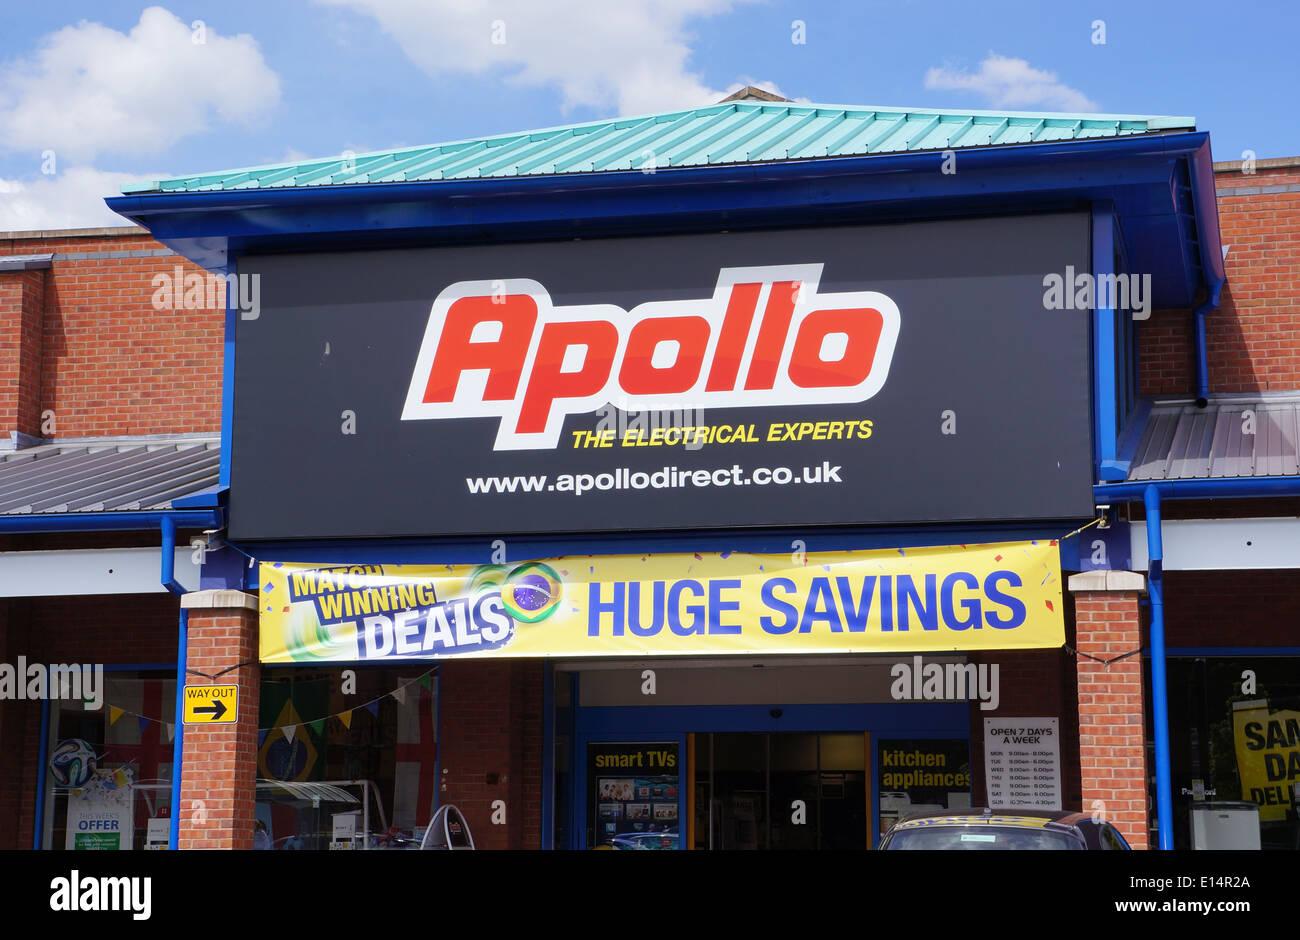 apollo, apollo 2000, hughs electrical store in uk - Stock Image